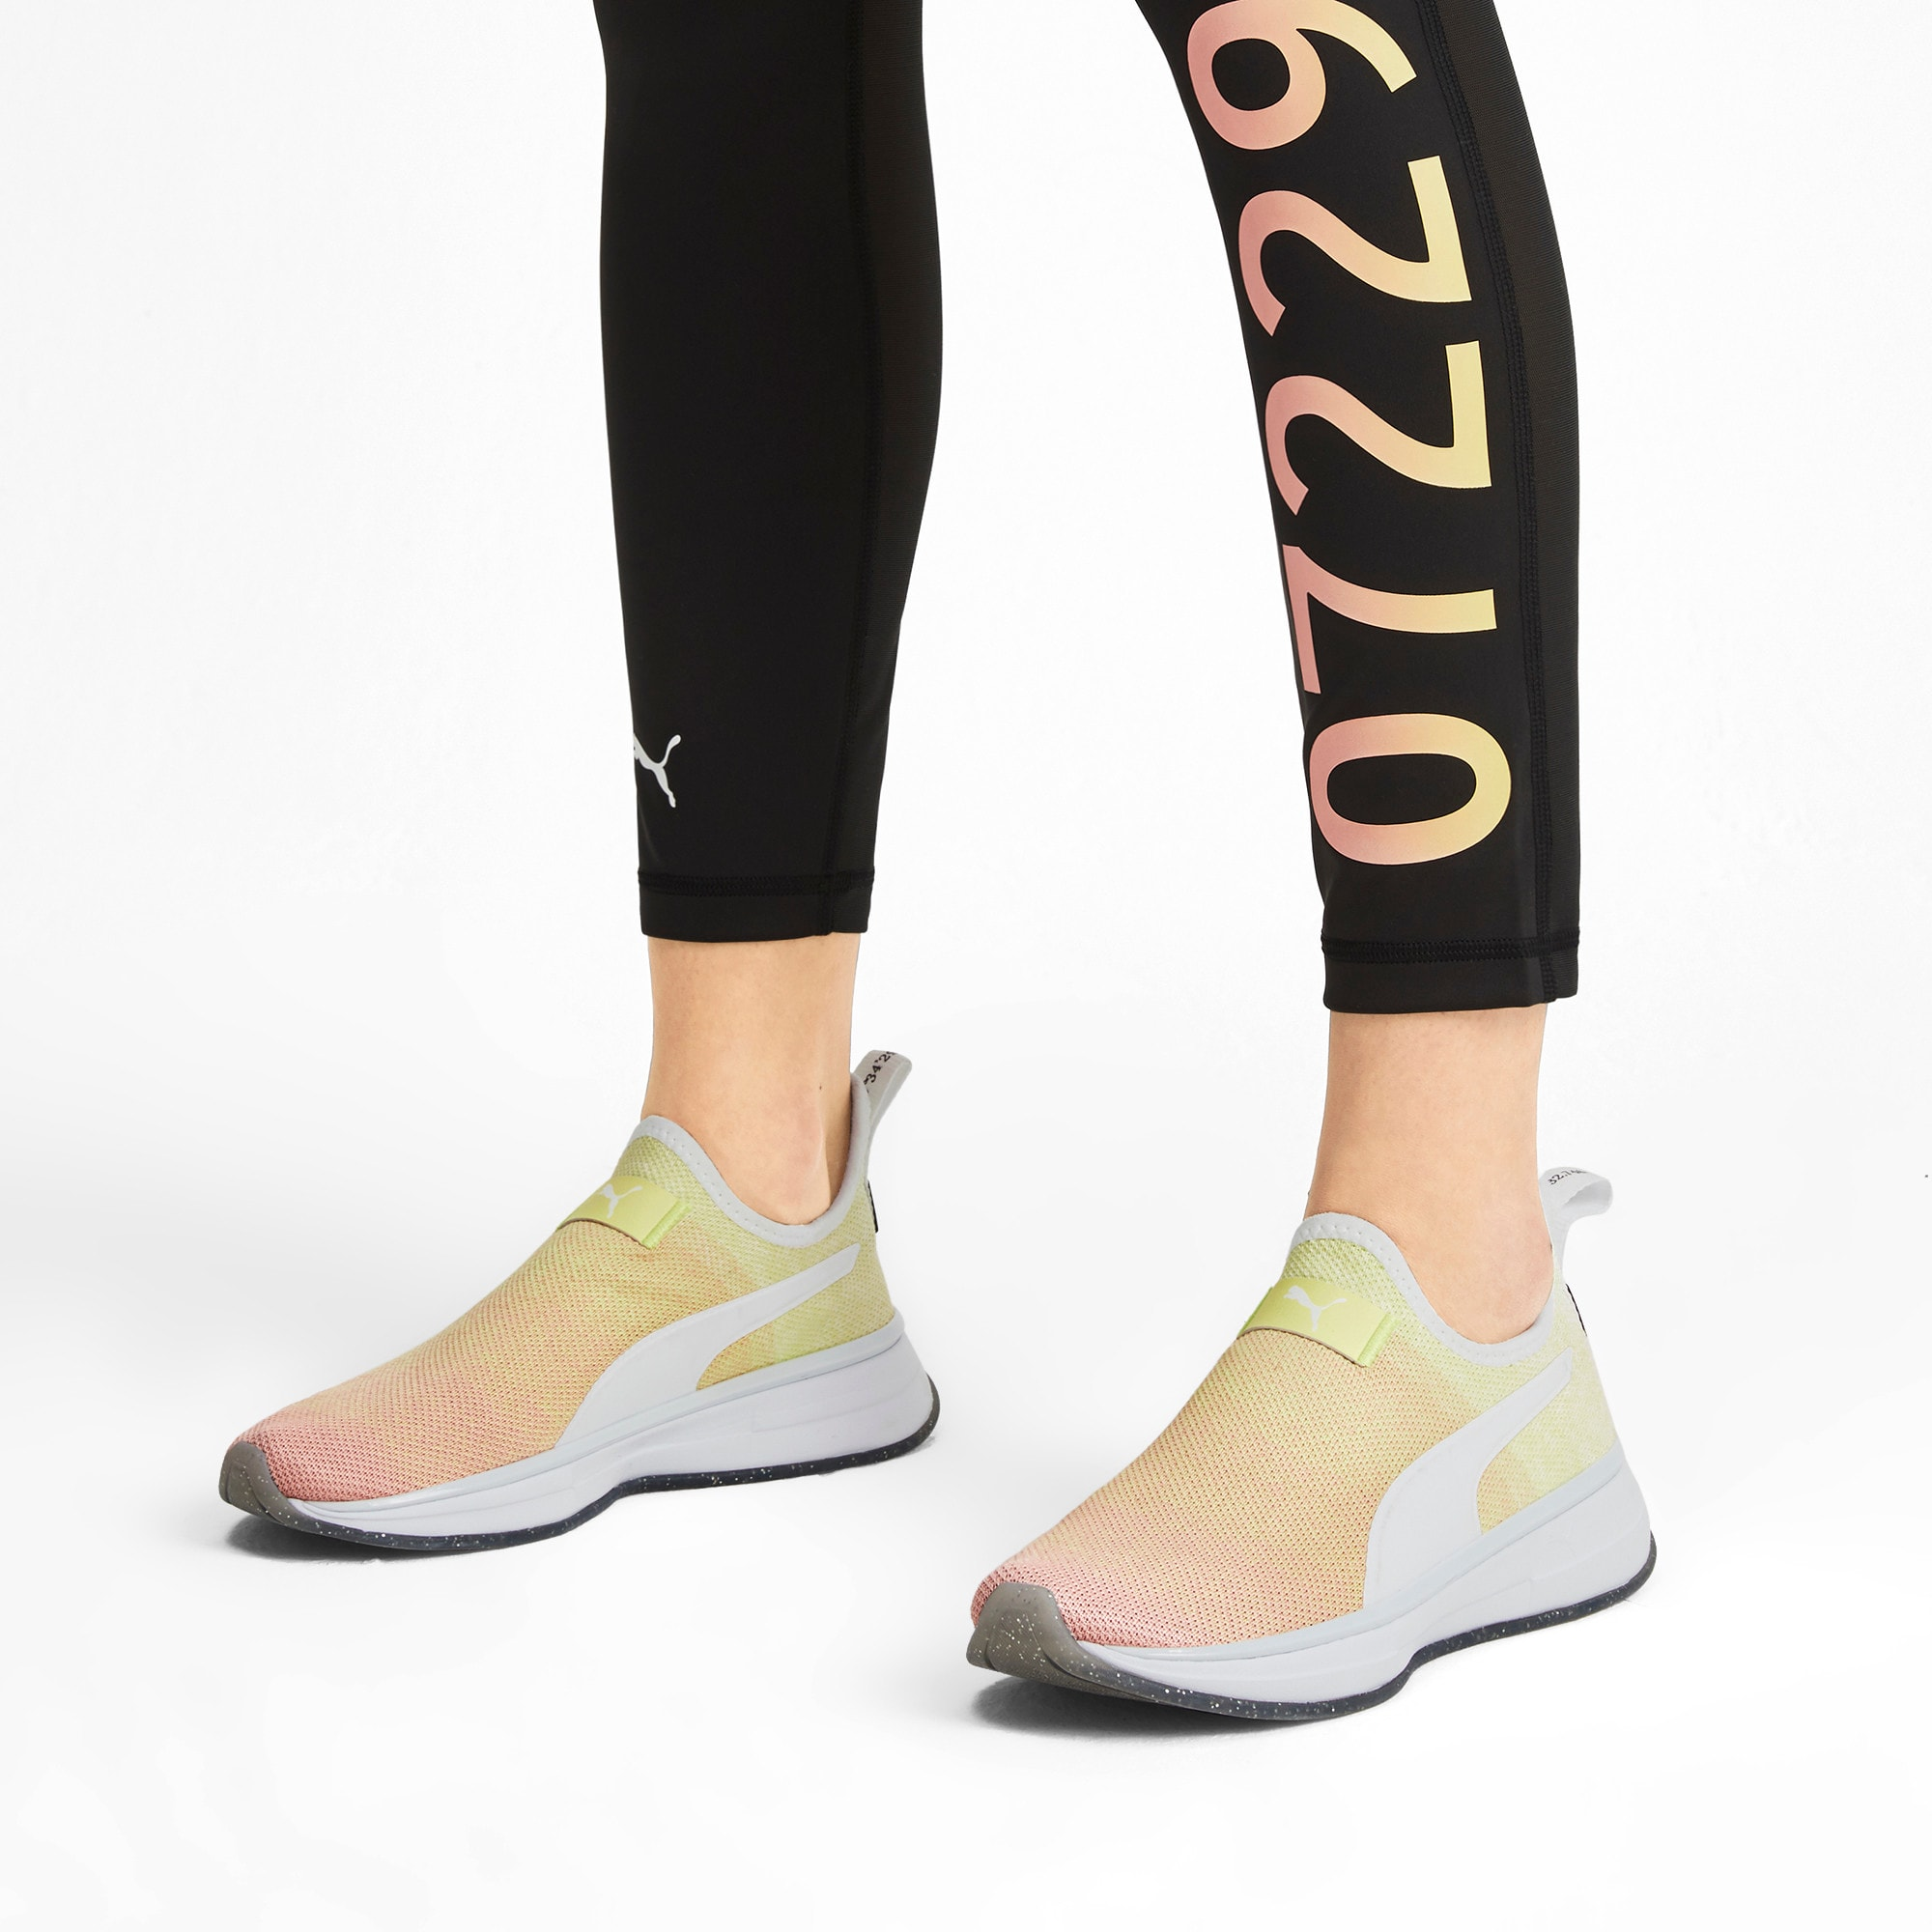 Thumbnail 2 of SG Slip-On Sunrise Women's Training Shoes, YELLOW-Peach Bud-White, medium